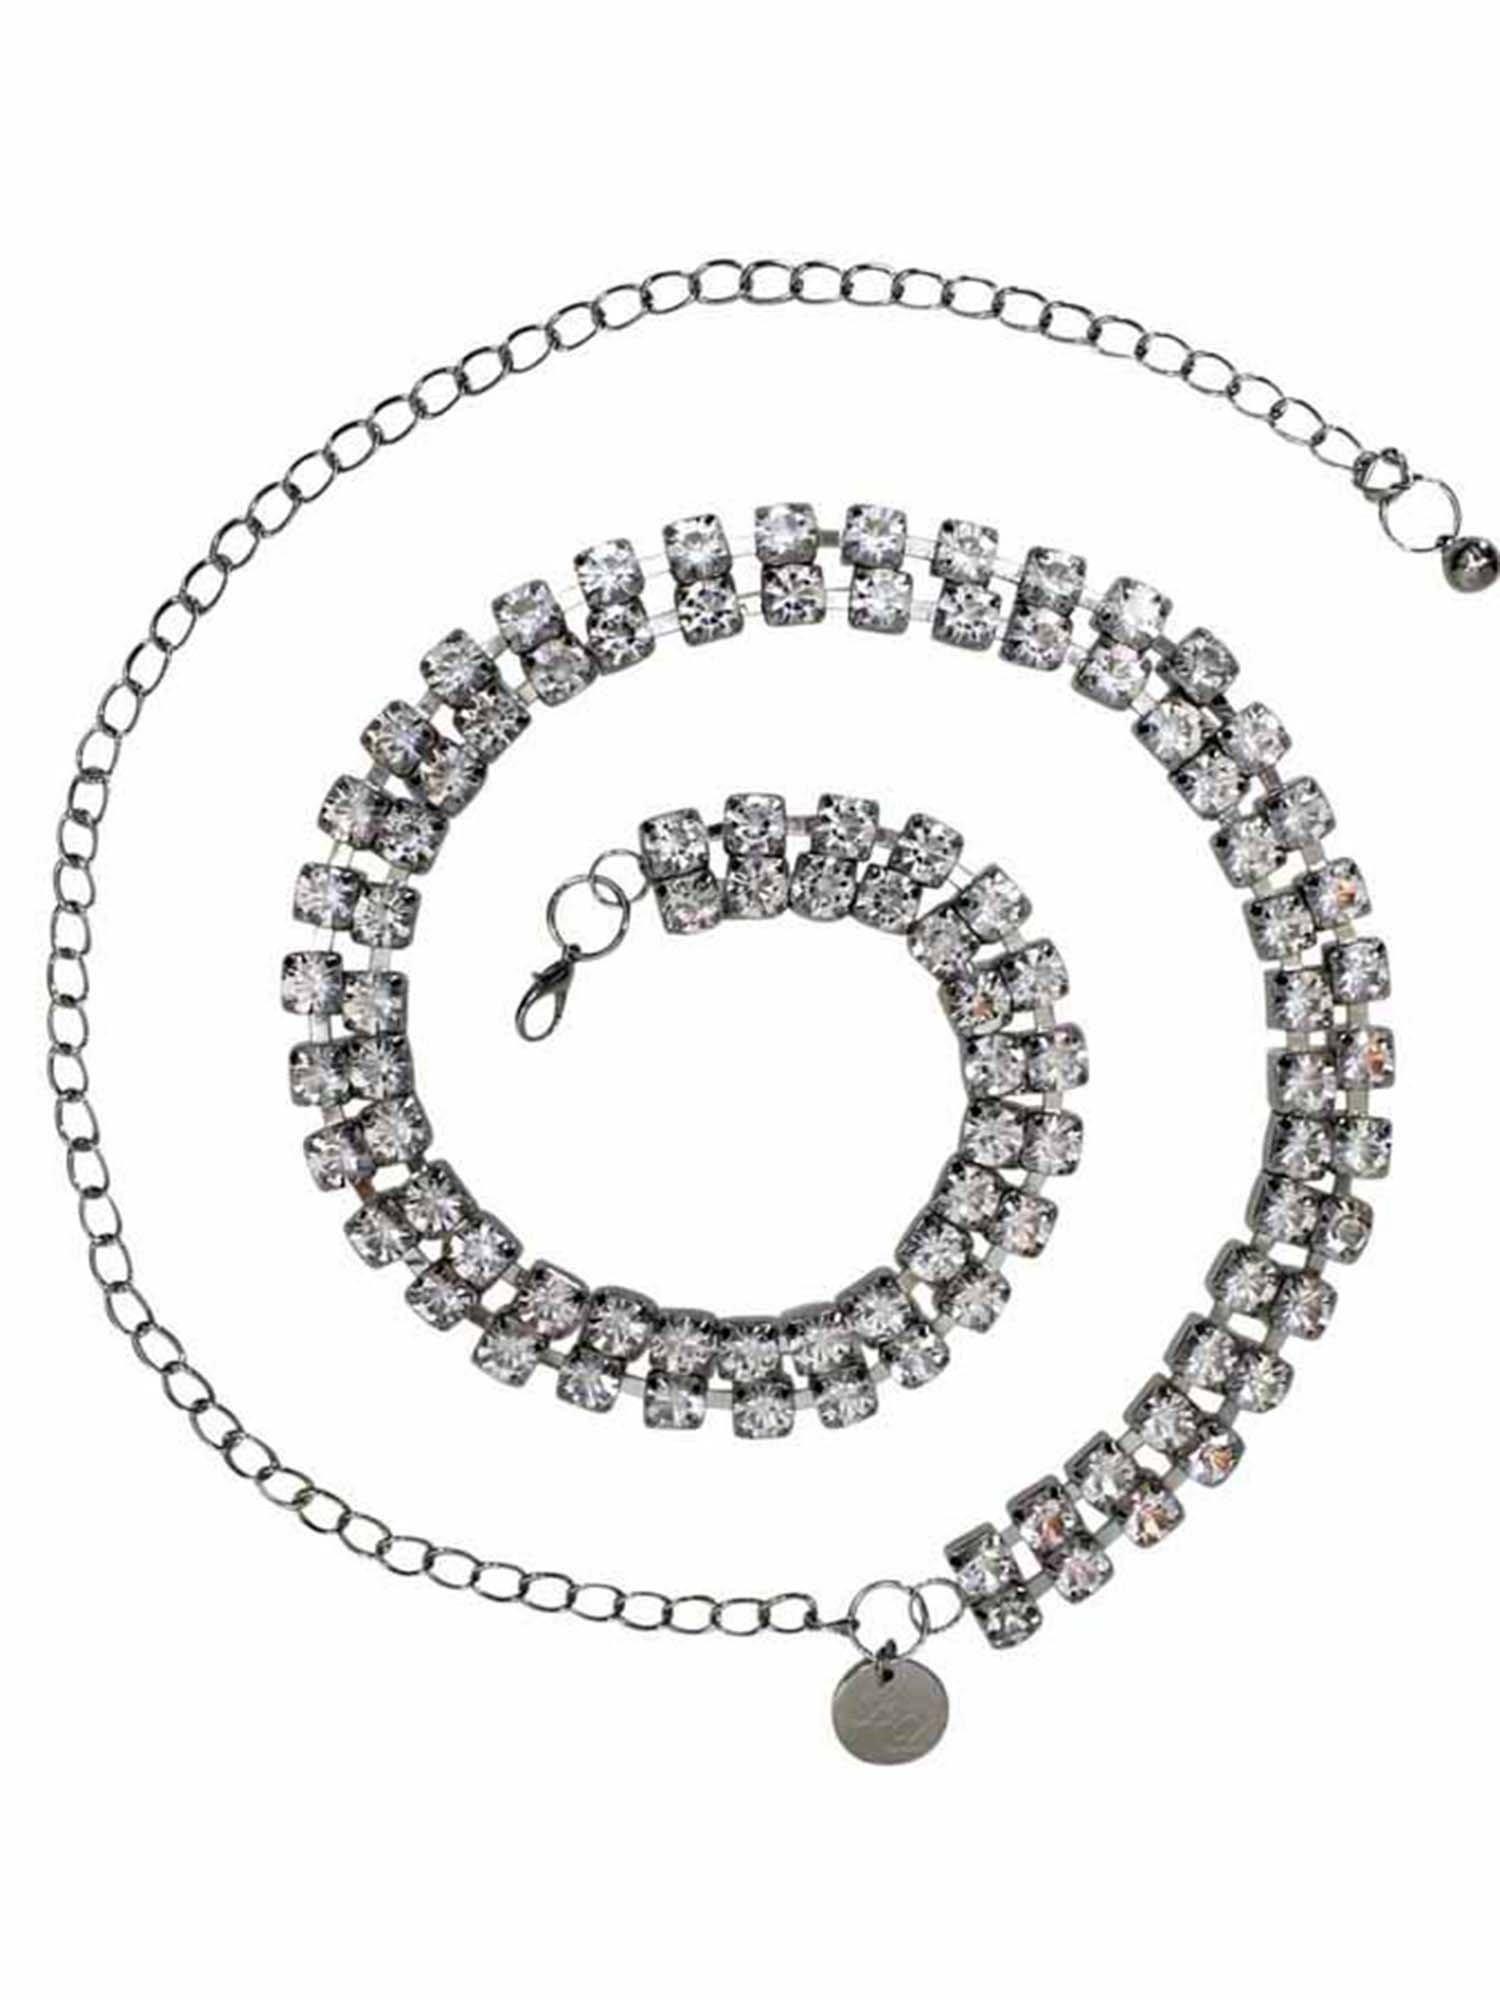 Silver Double Row Crystal Rhinestone Chain Link Belt by Luxury Divas